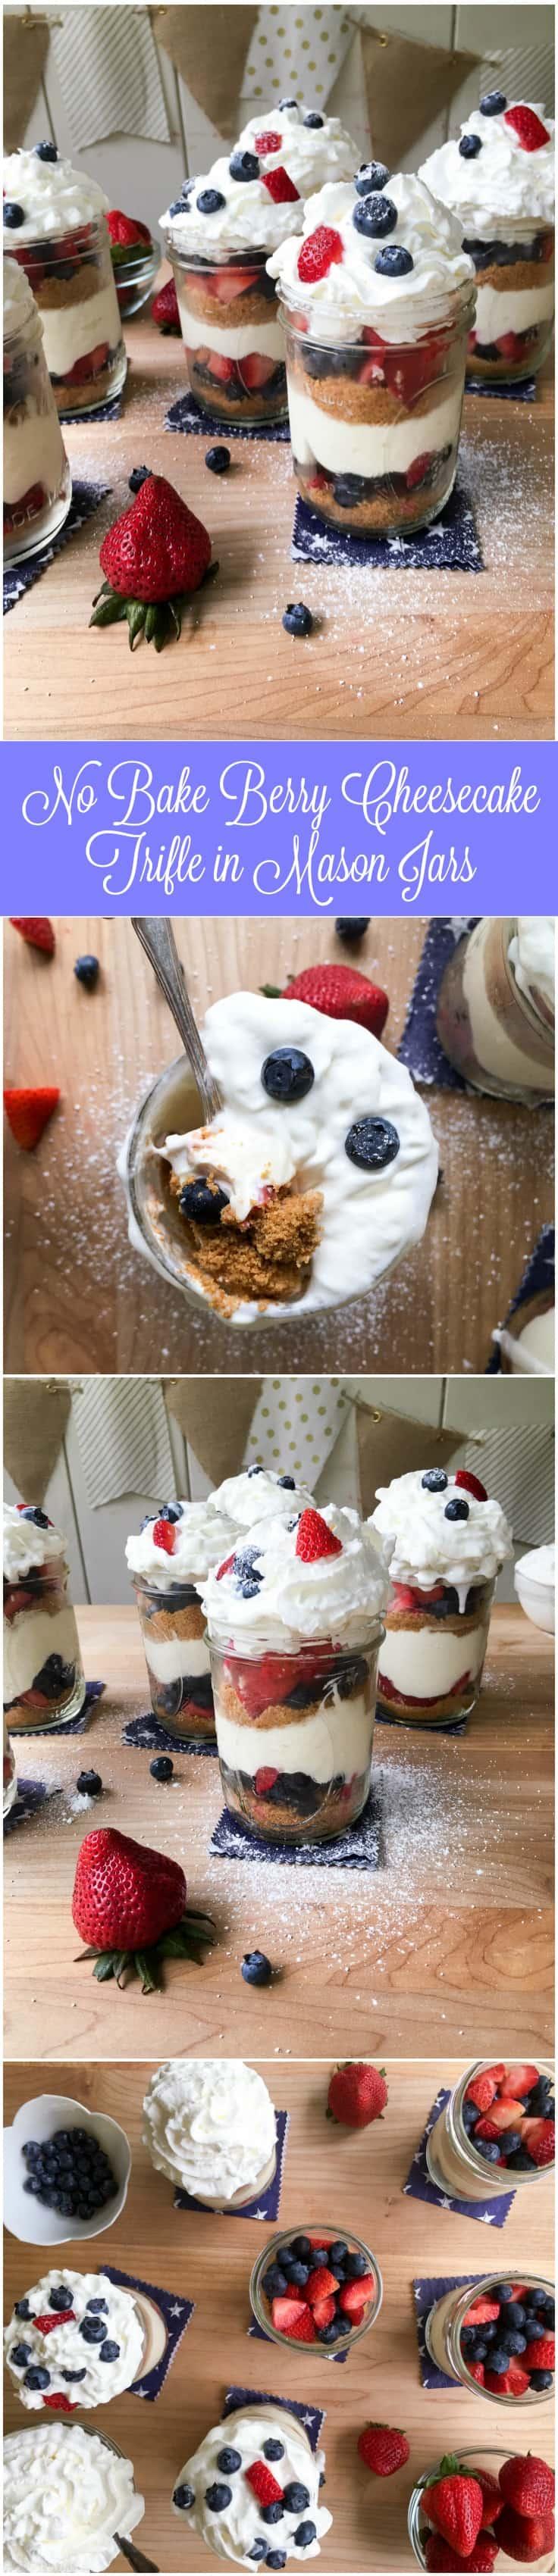 No Bake Berry Cheesecake Trifle in Mason Jars 736x3400